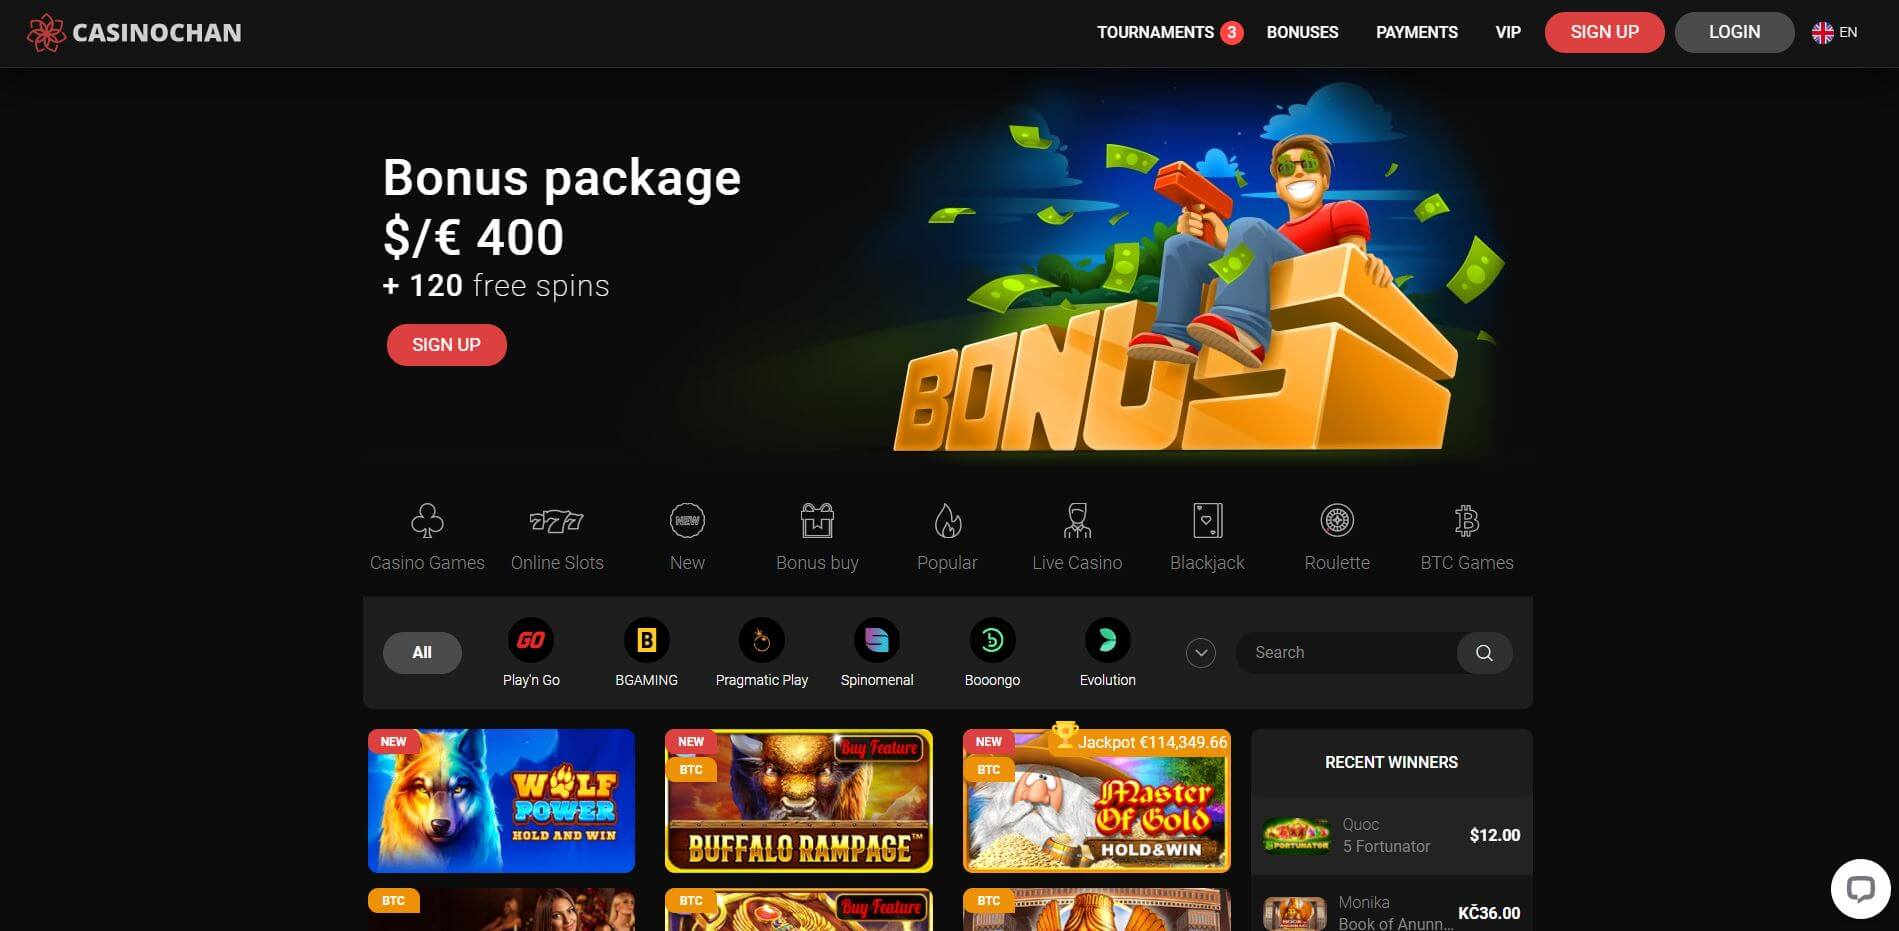 Casino Chan Homepage